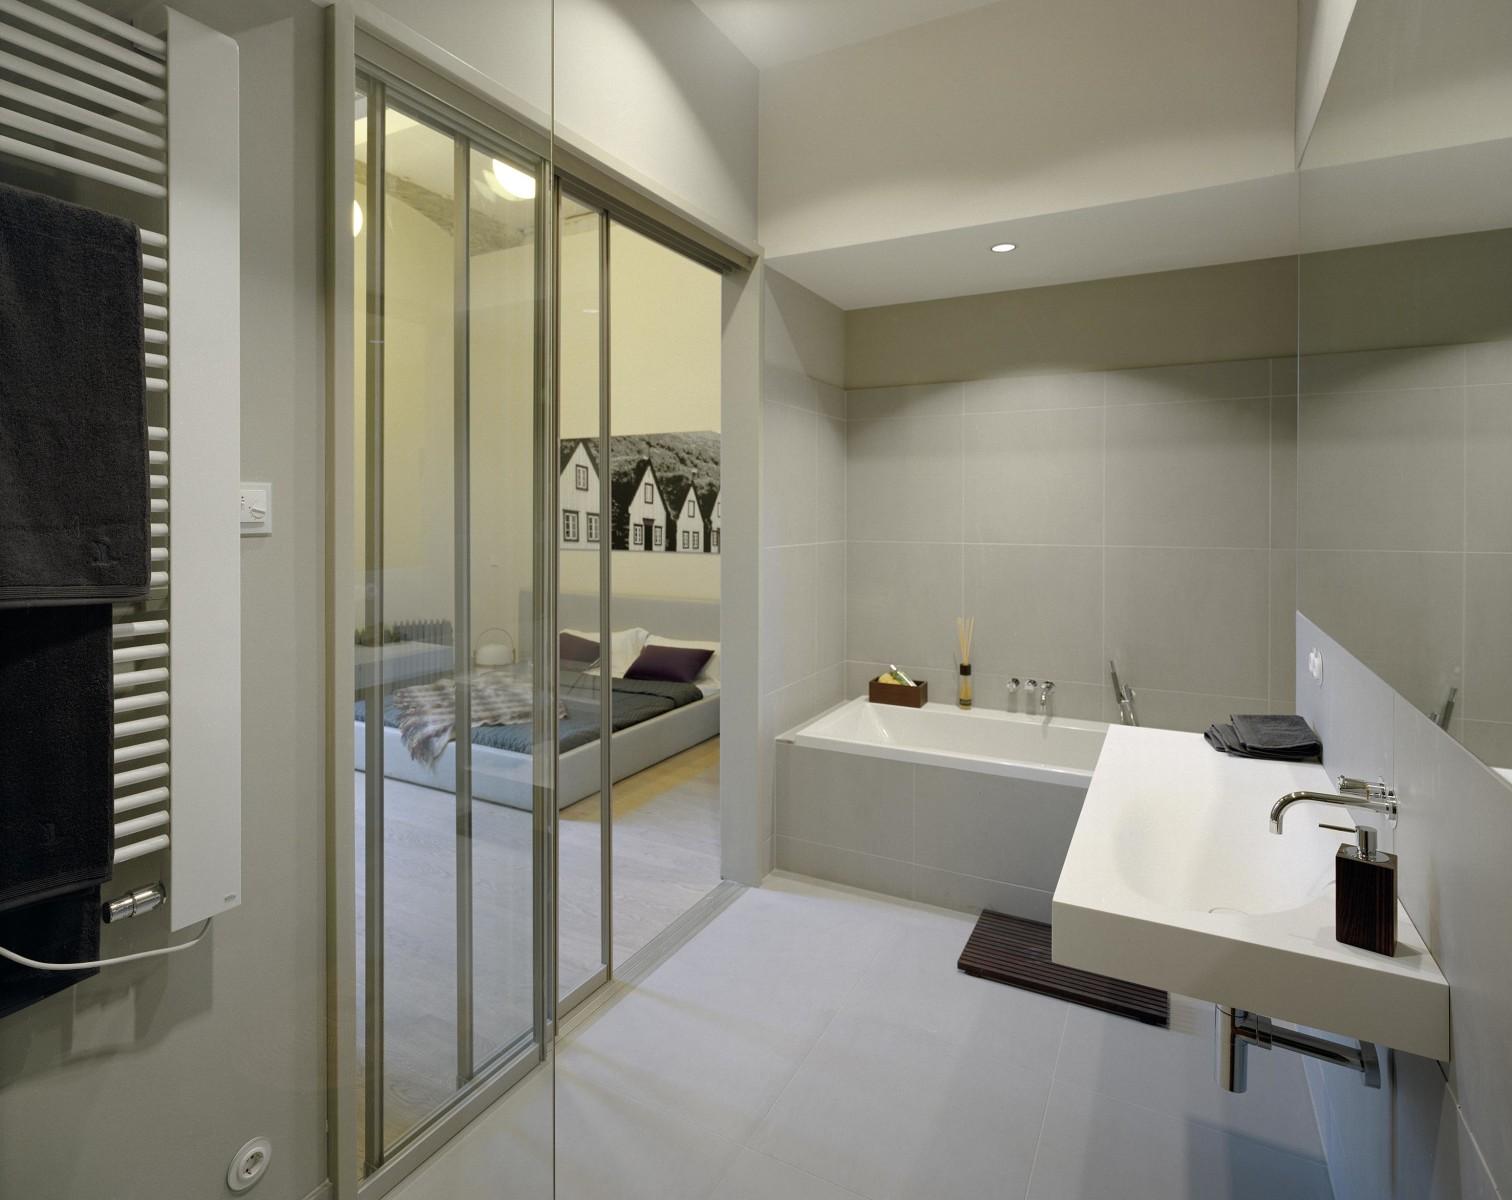 loft living callwey architekturb cher. Black Bedroom Furniture Sets. Home Design Ideas